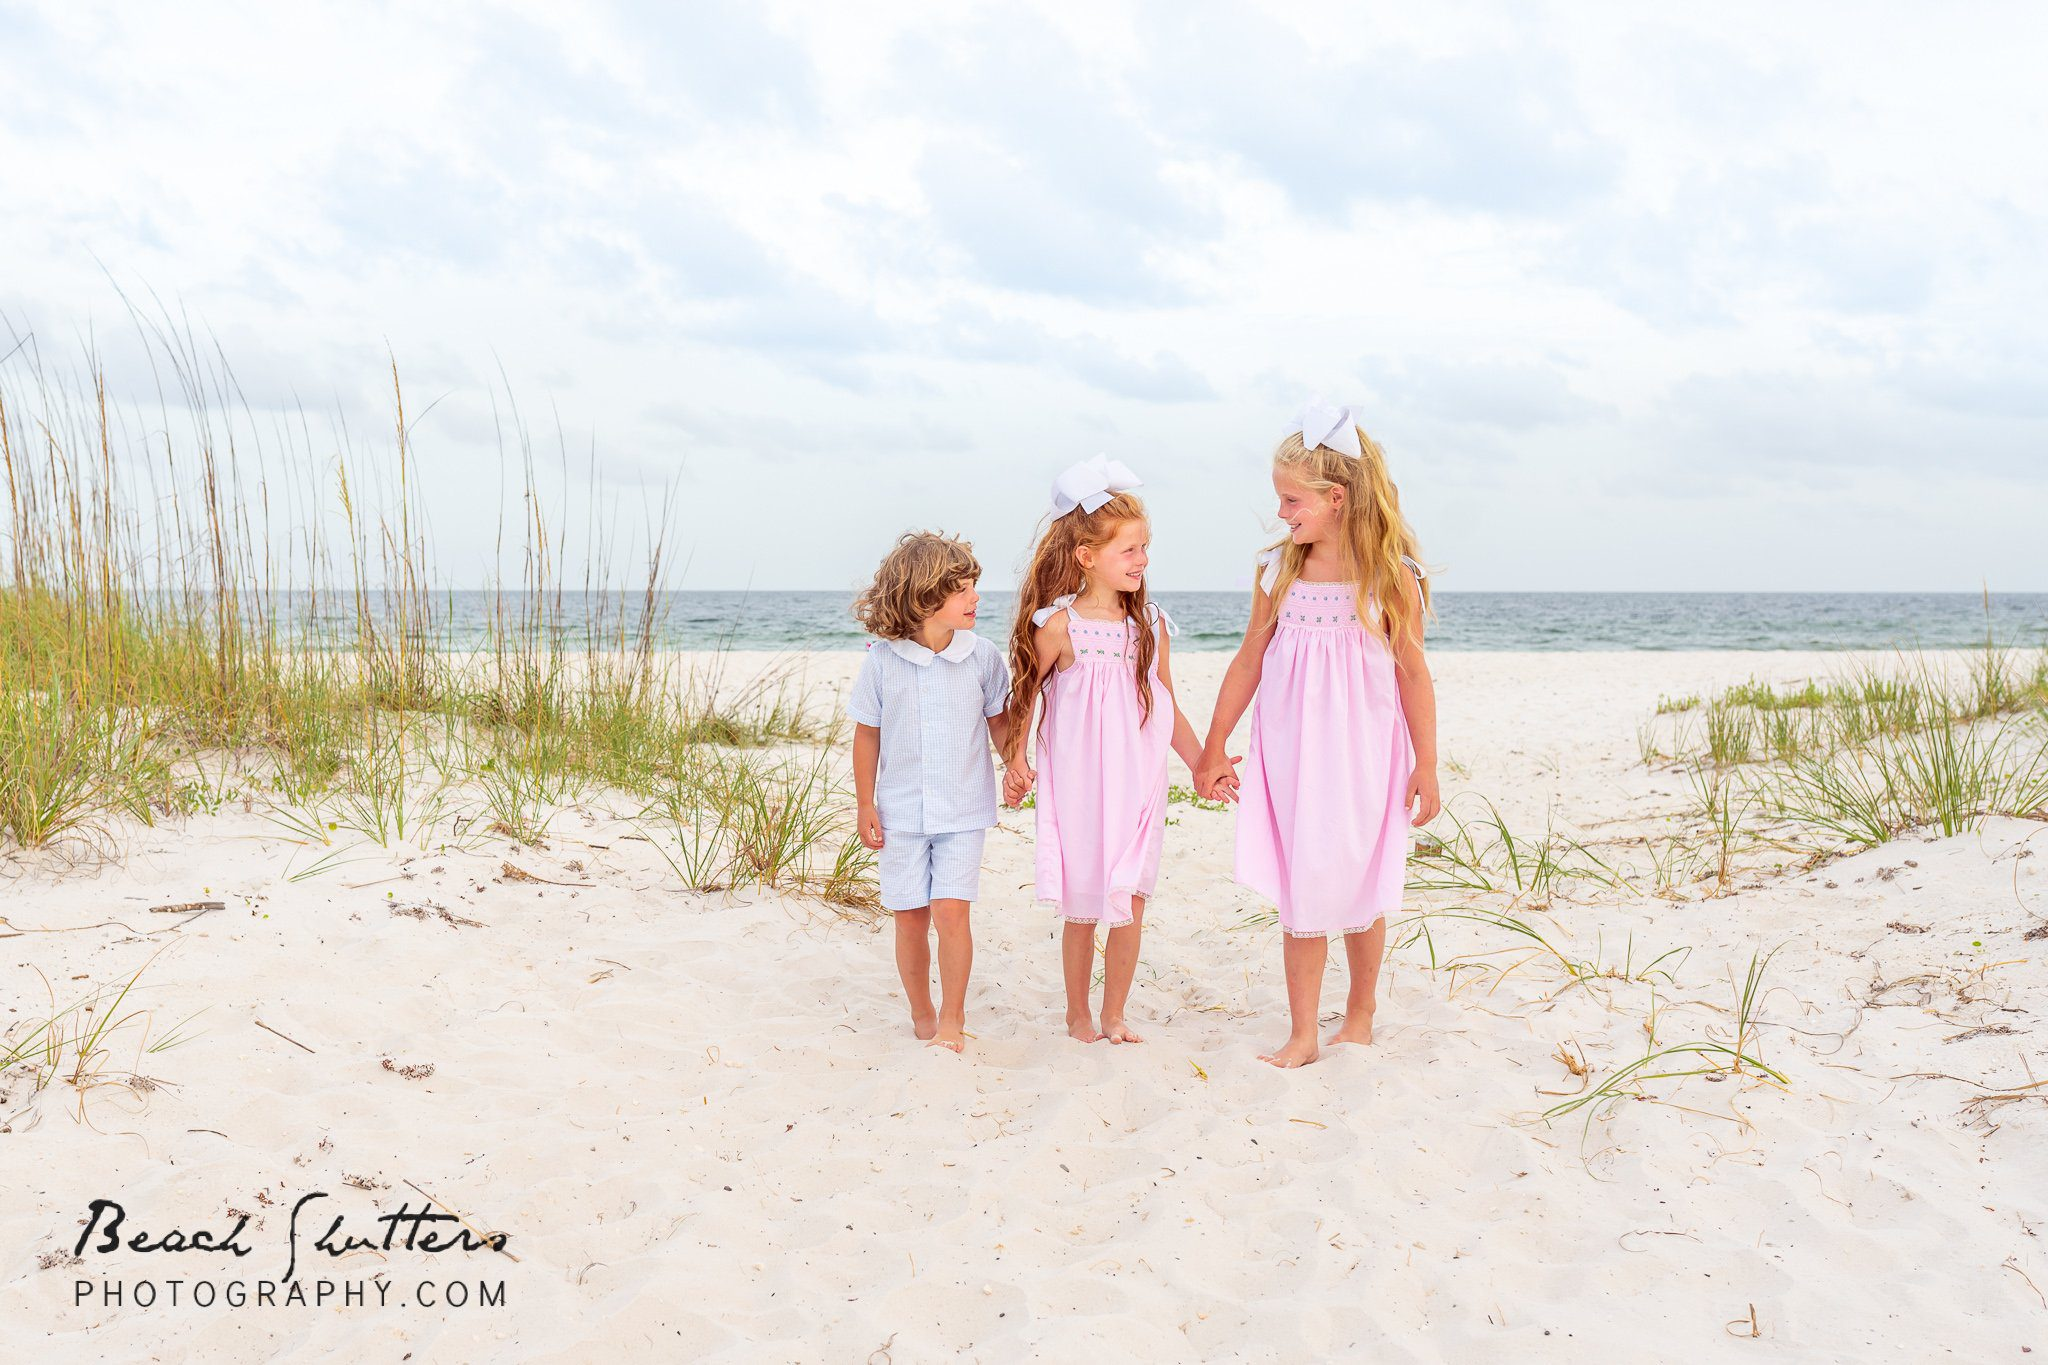 beach portraits in Perdido Key Florida by Beach Shutters